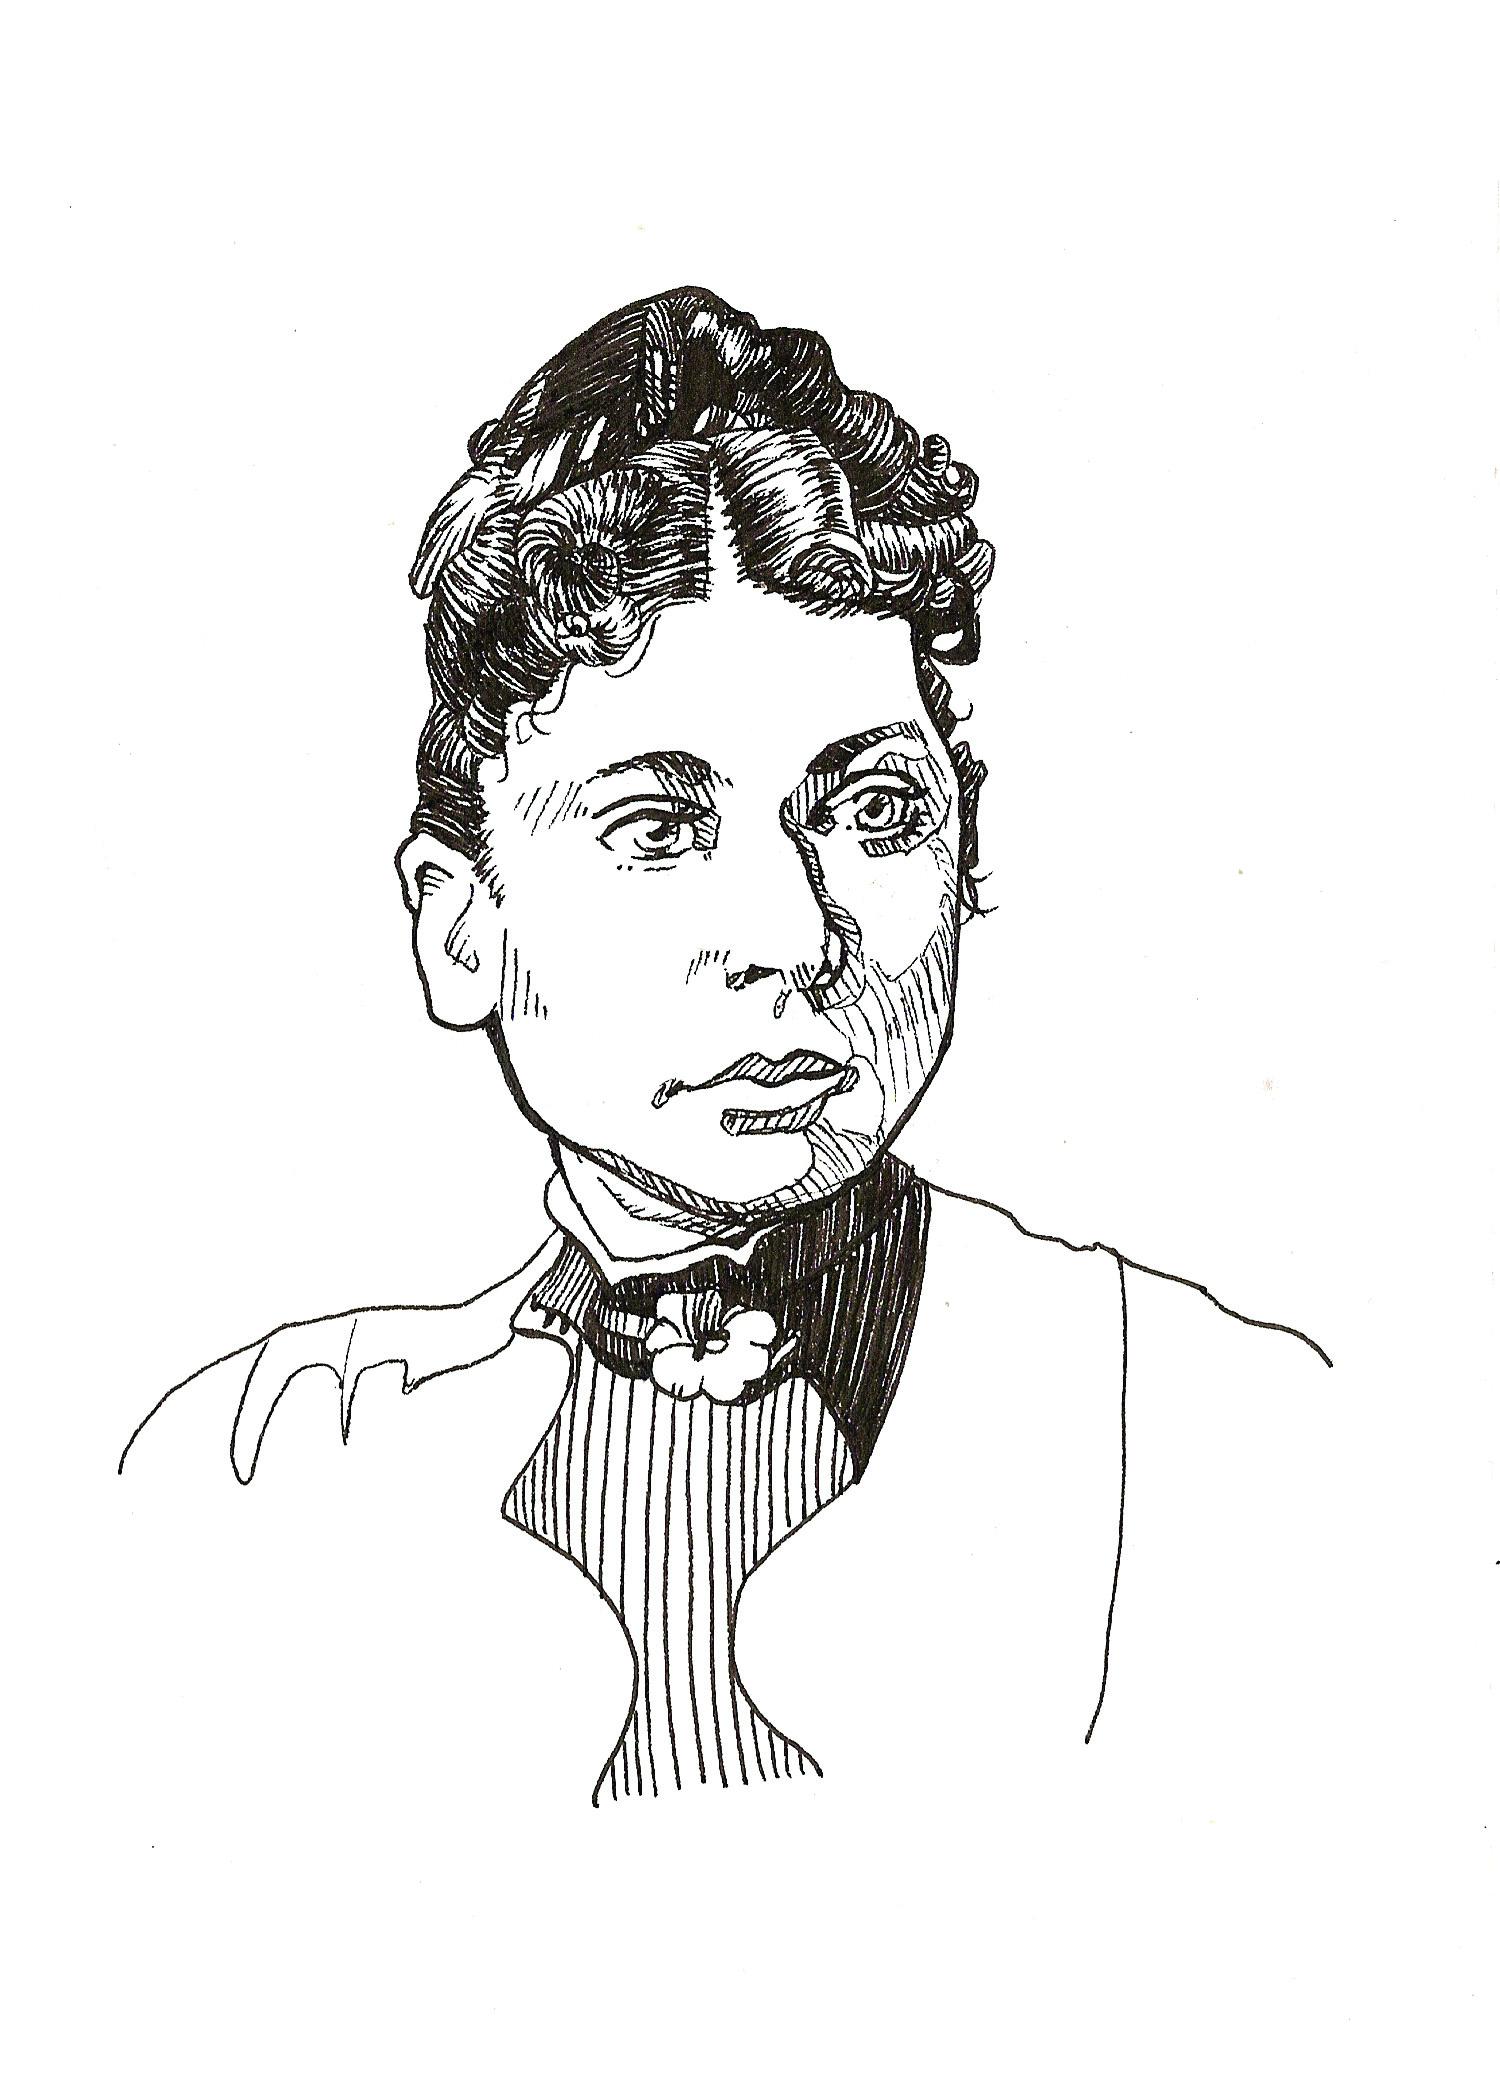 Lizzy Borden     A C C U S E D  M U R D E R E S S